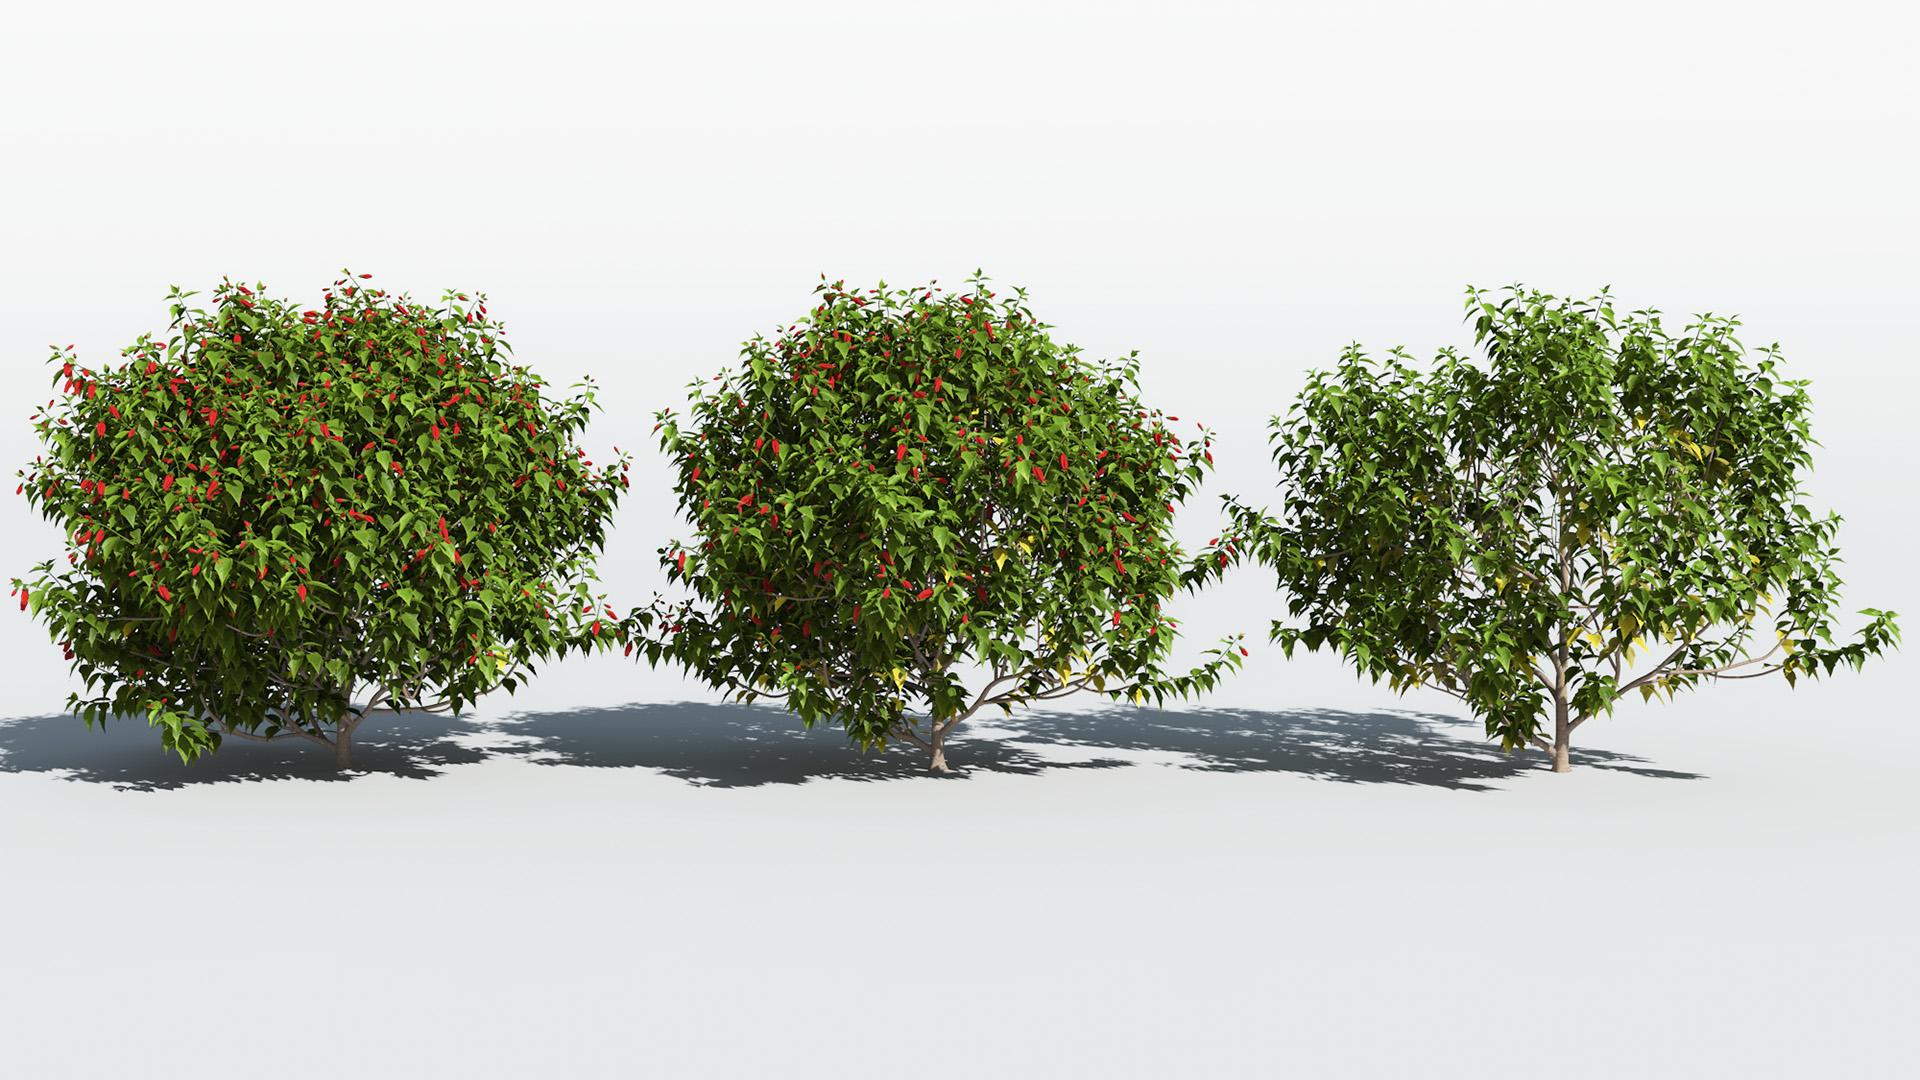 3D model of the Turks cap mallow Malvaviscus penduliflorus health variations